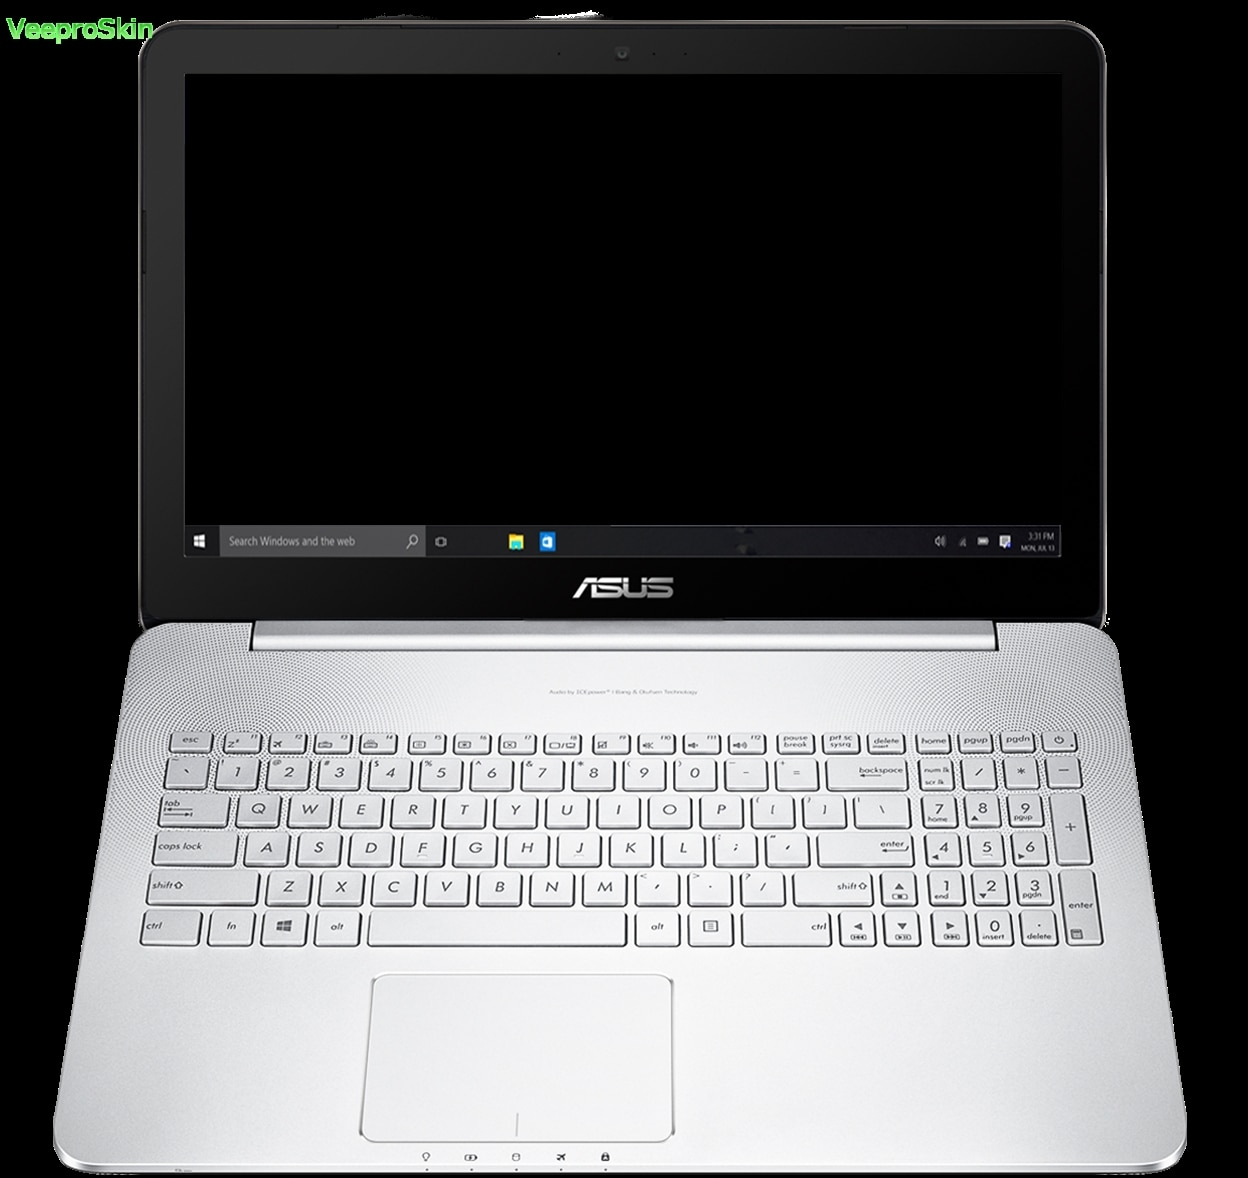 Для Asus VivoBook Pro N752VX N752V n751jx n751jk N751 n750jk n750jv n750j n750 17 17,3 дюйм чехол для клавиатуры протектор кожи